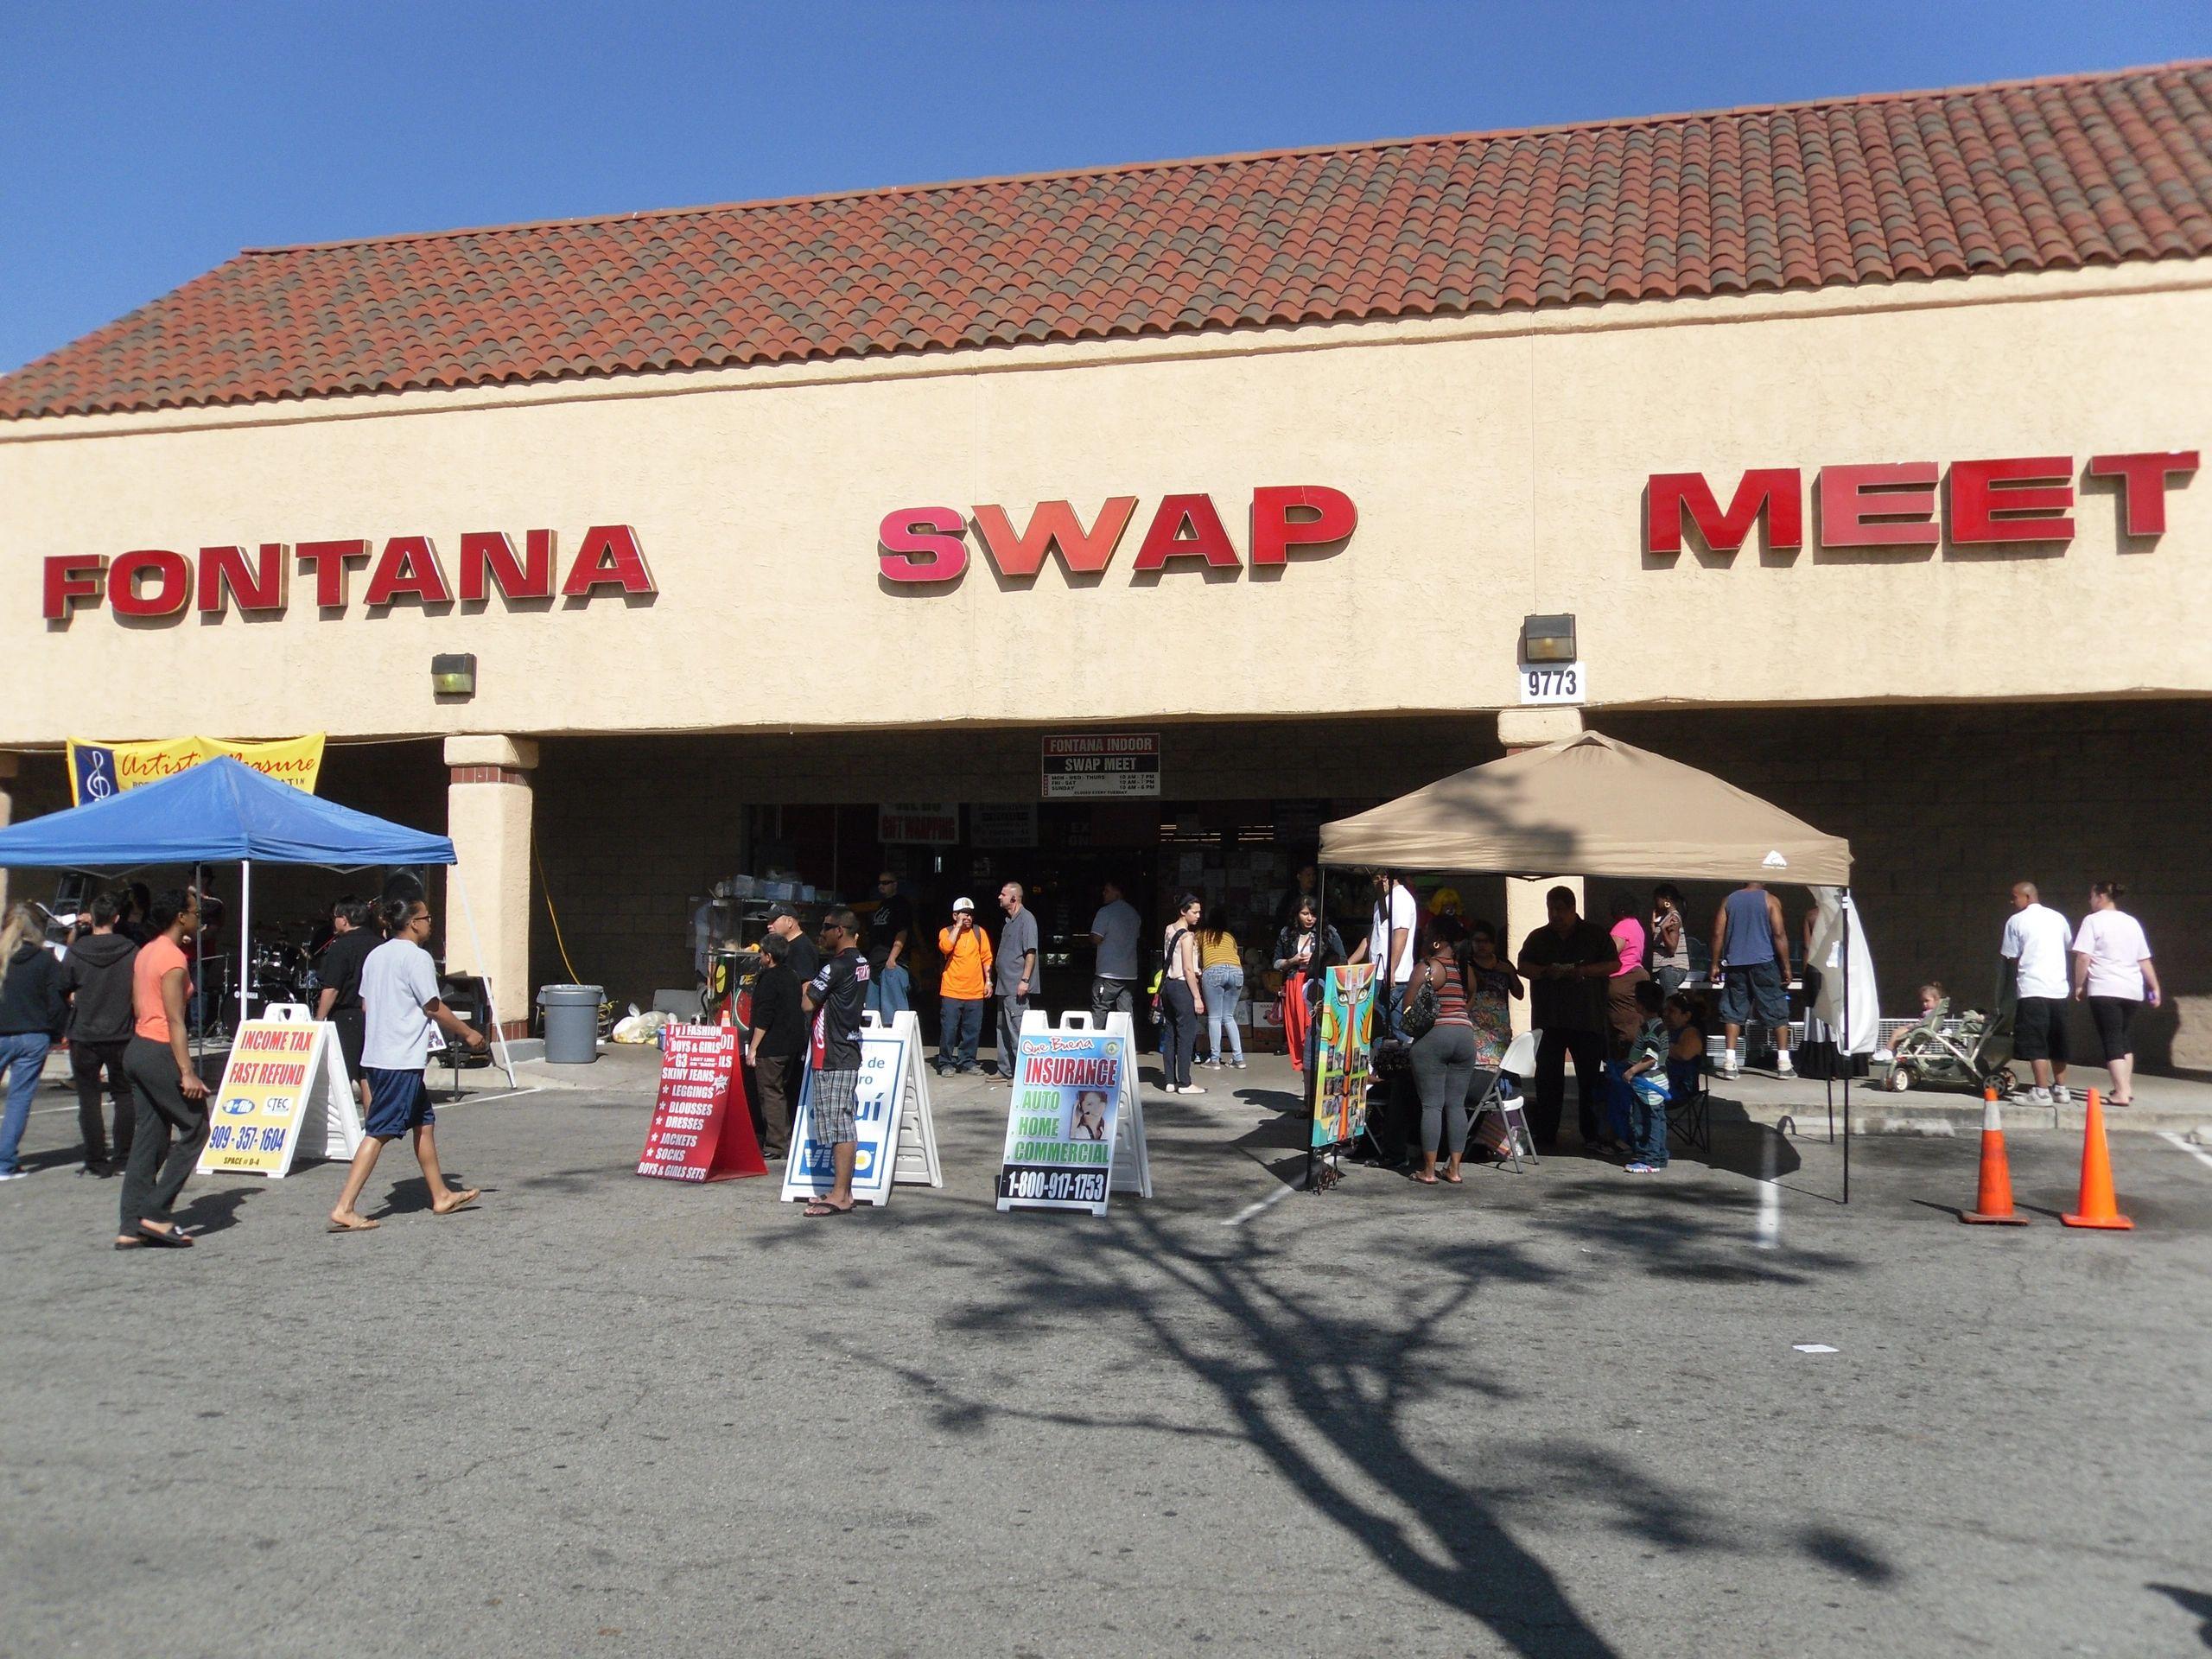 fontana swap meet in california